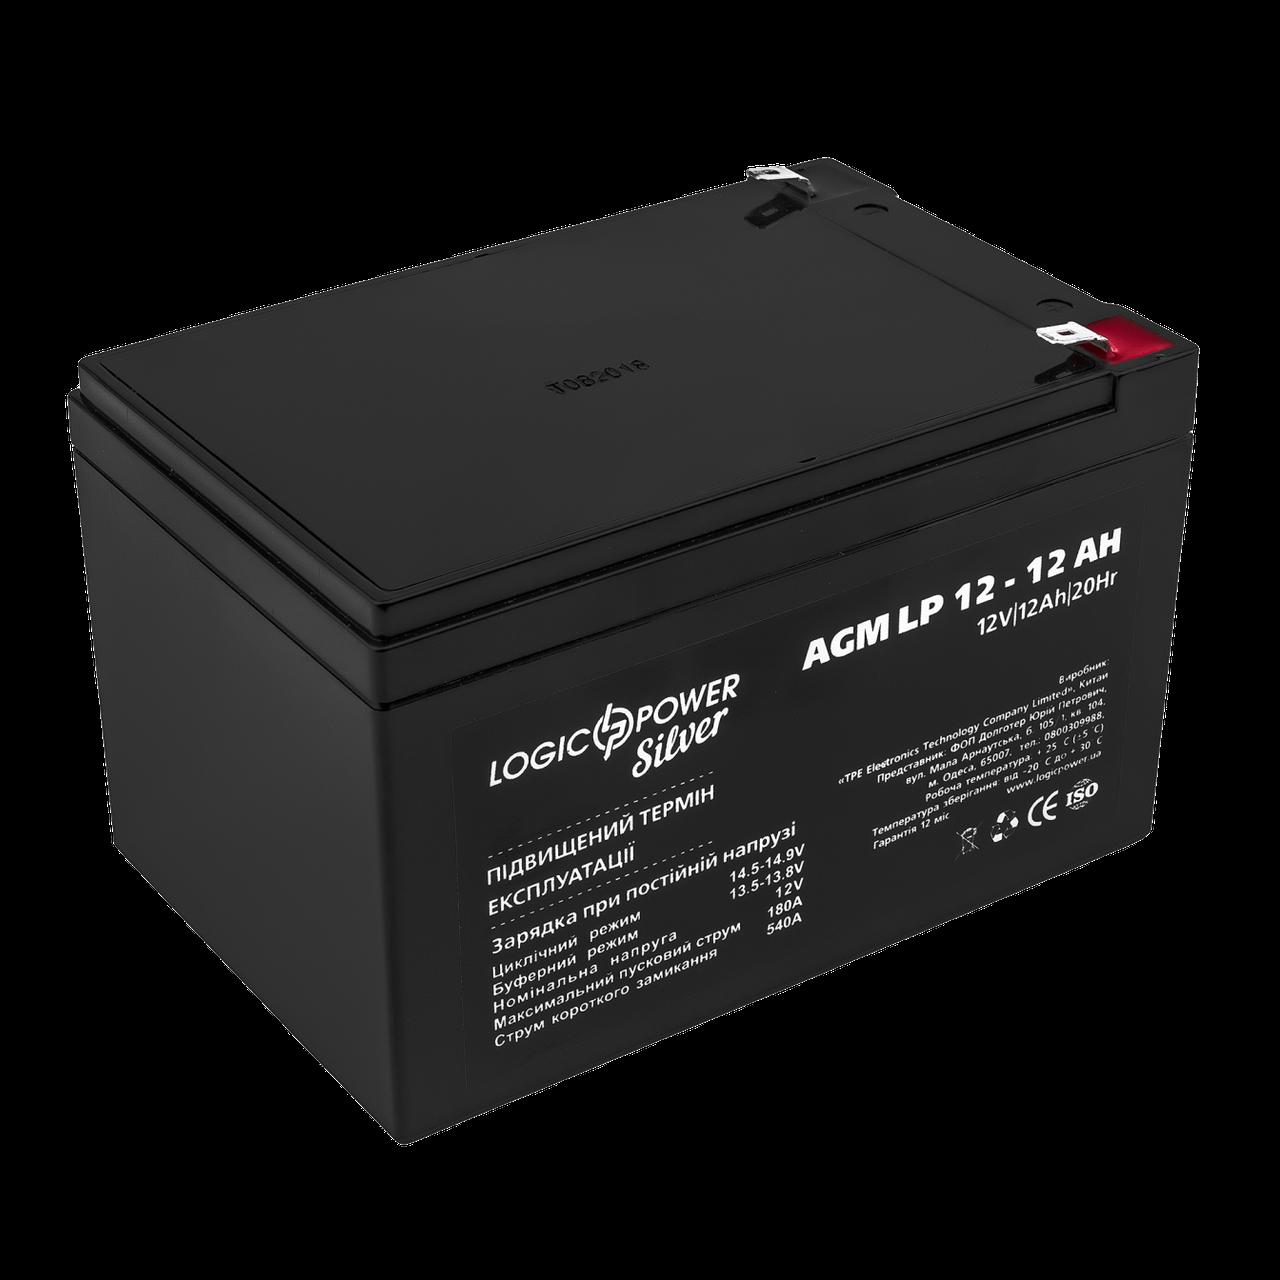 Аккумулятор кислотный AGM LogicPower LP 12 - 12 AH SILVER